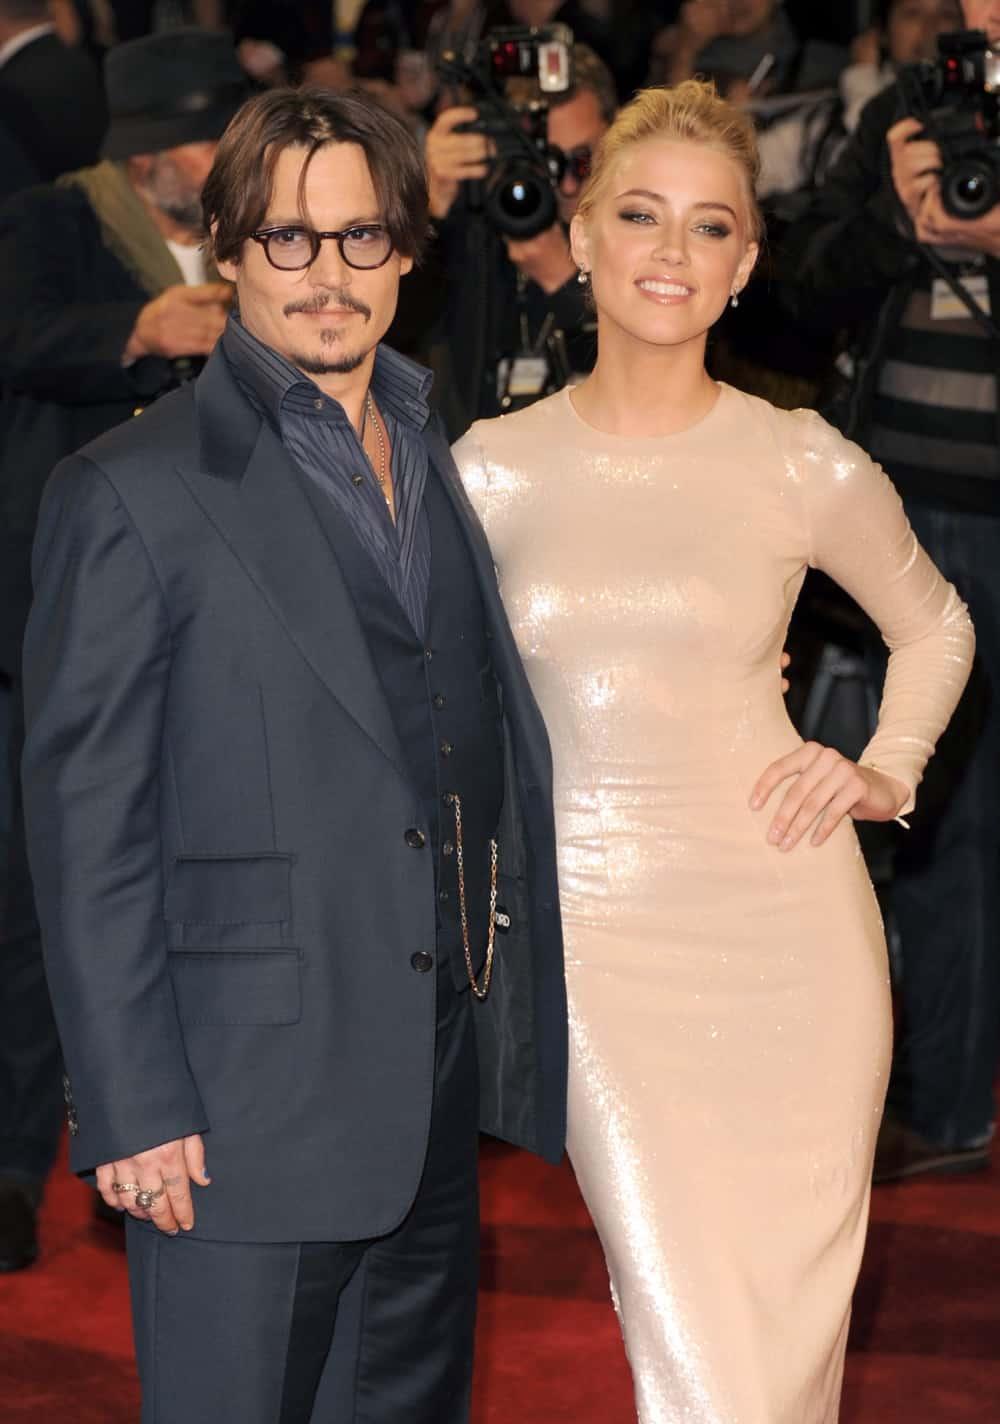 Johnny Depp and Amber Heard The Rum Diary - European Premiere